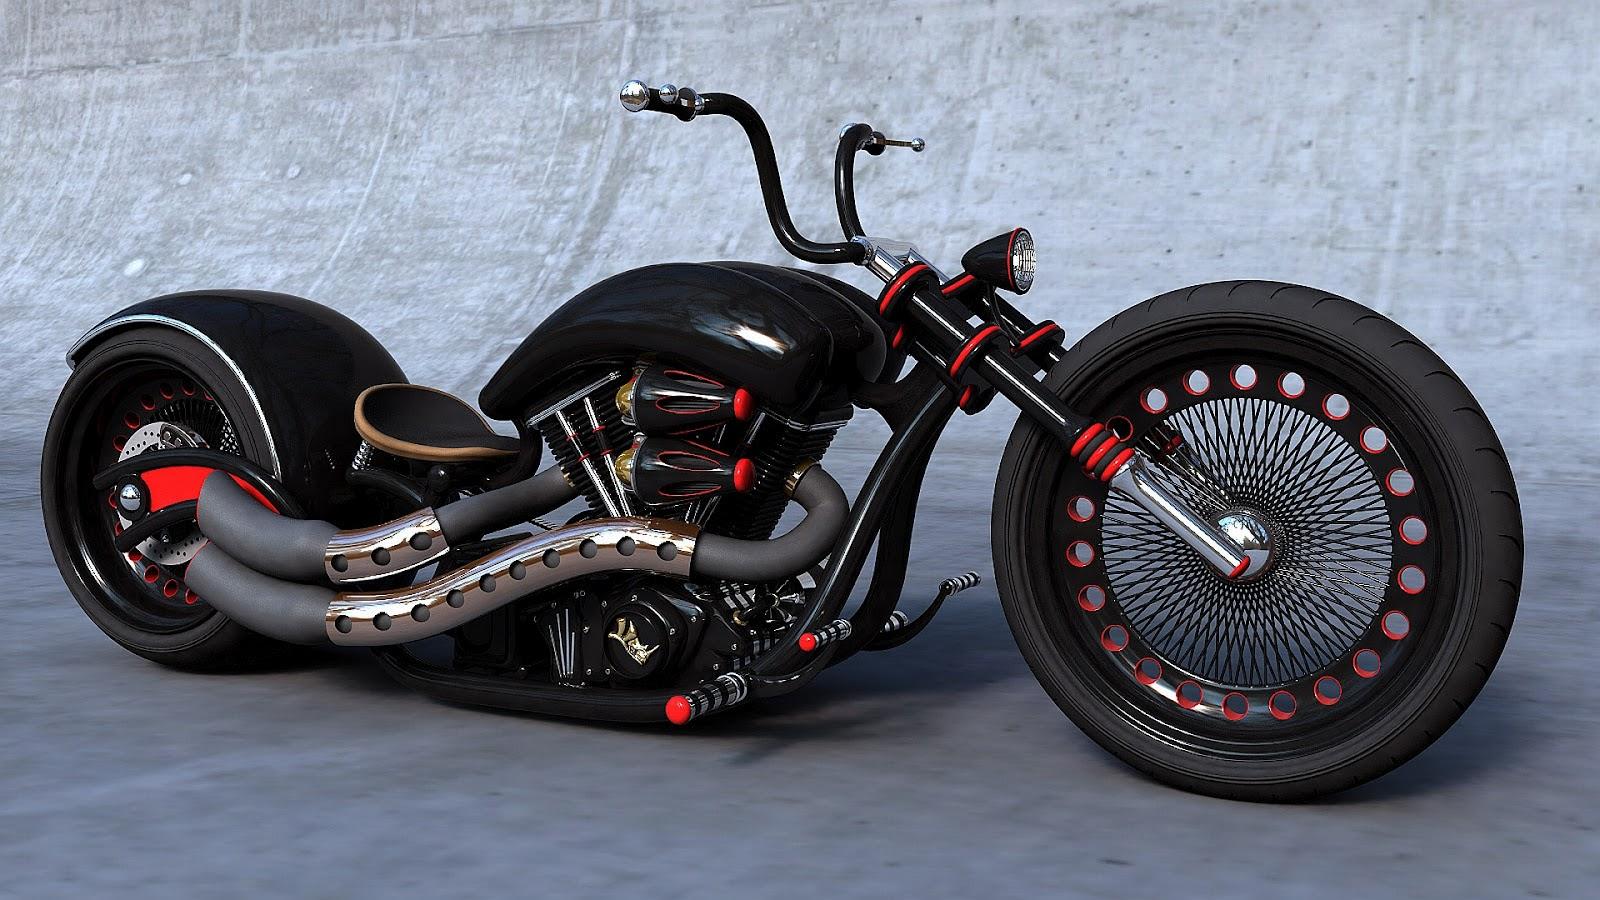 hd-wallpaper-of-bikes